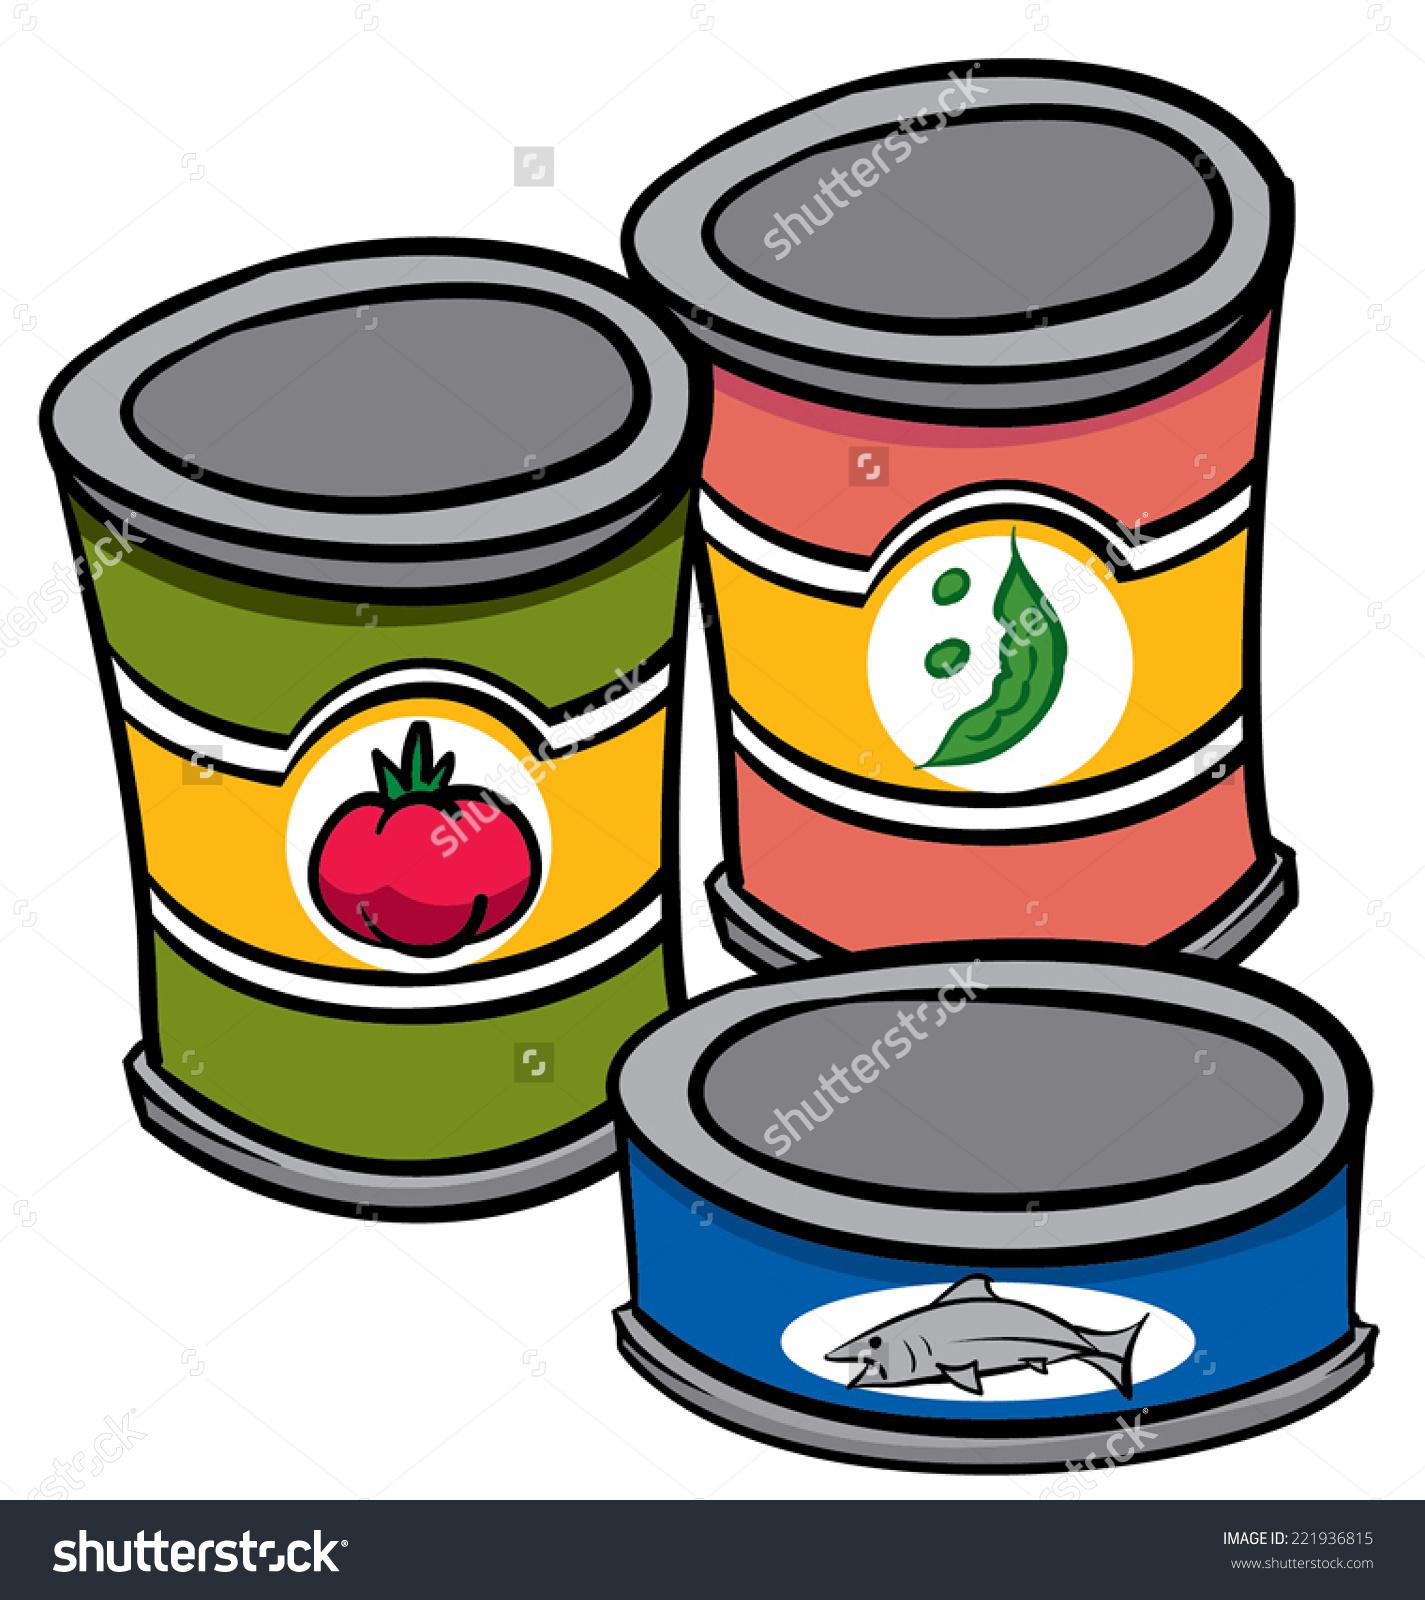 Canned Food Clipart. 52f8c53d723f40b7820-Canned Food Clipart. 52f8c53d723f40b7820390cff6ea26 .-9